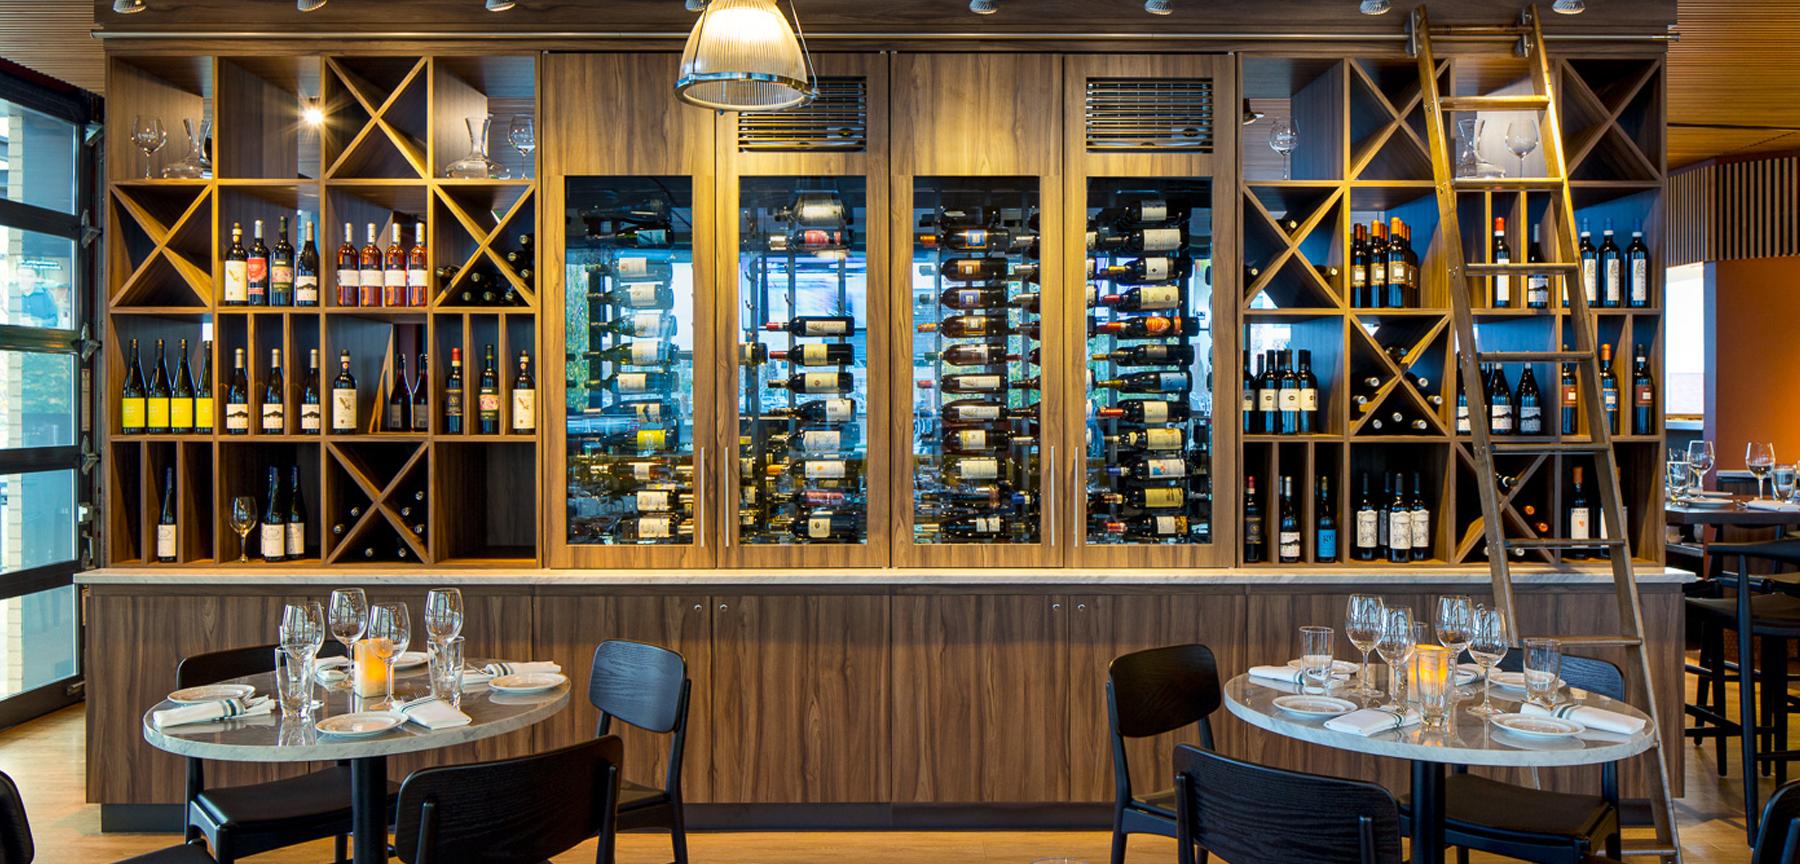 Cafe Mercato wine bar